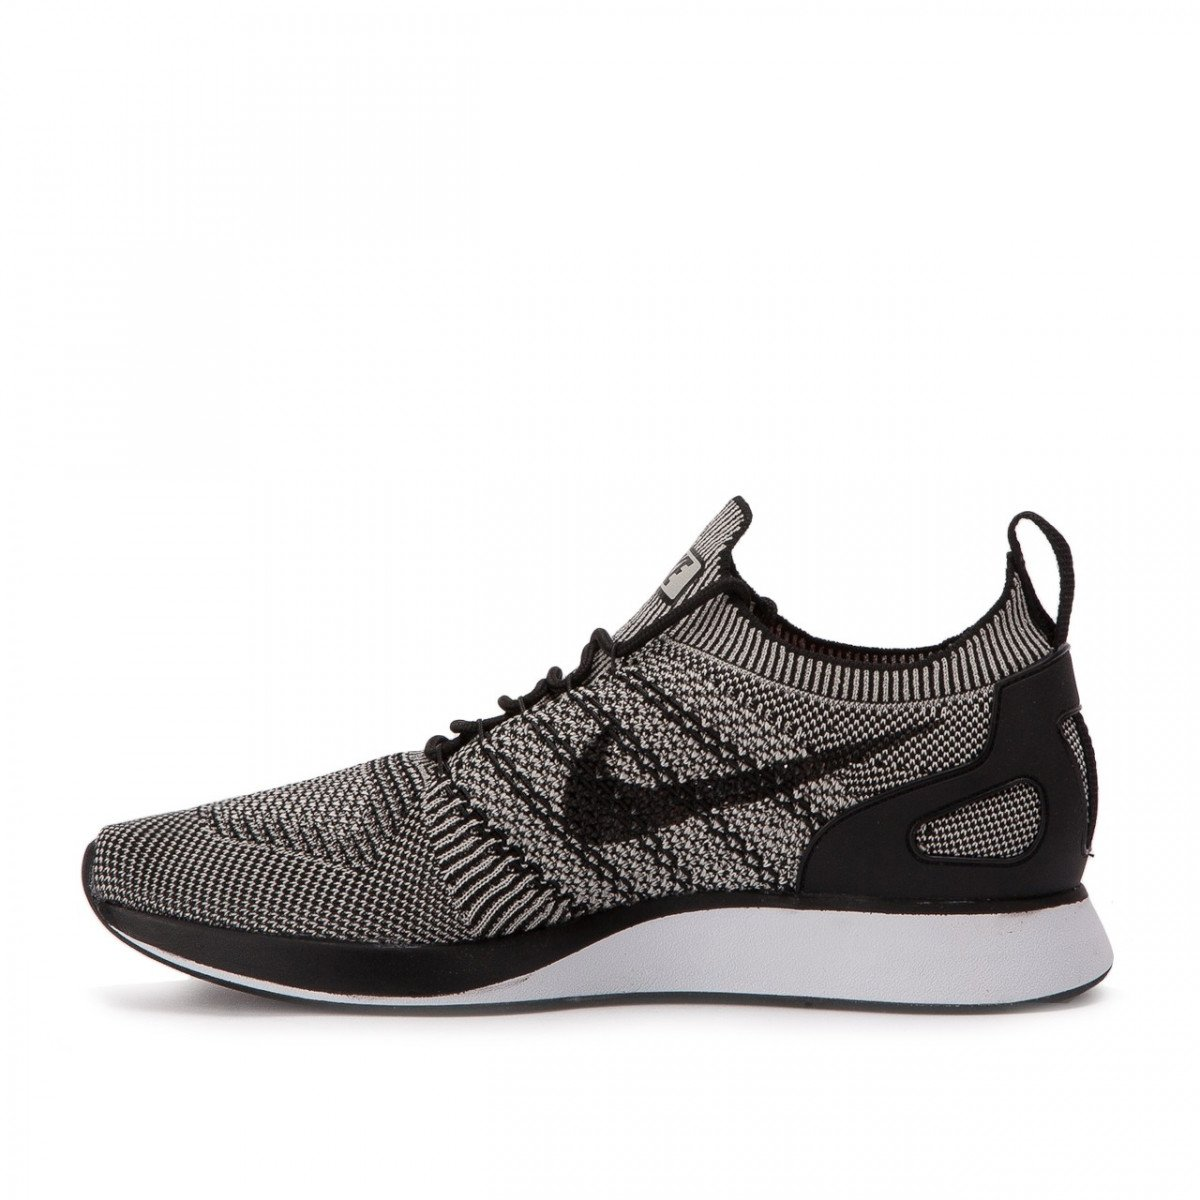 Nike Men's Zoom mariah Flyknit Racer Grey/Black 918264-003 , 10 D(M)